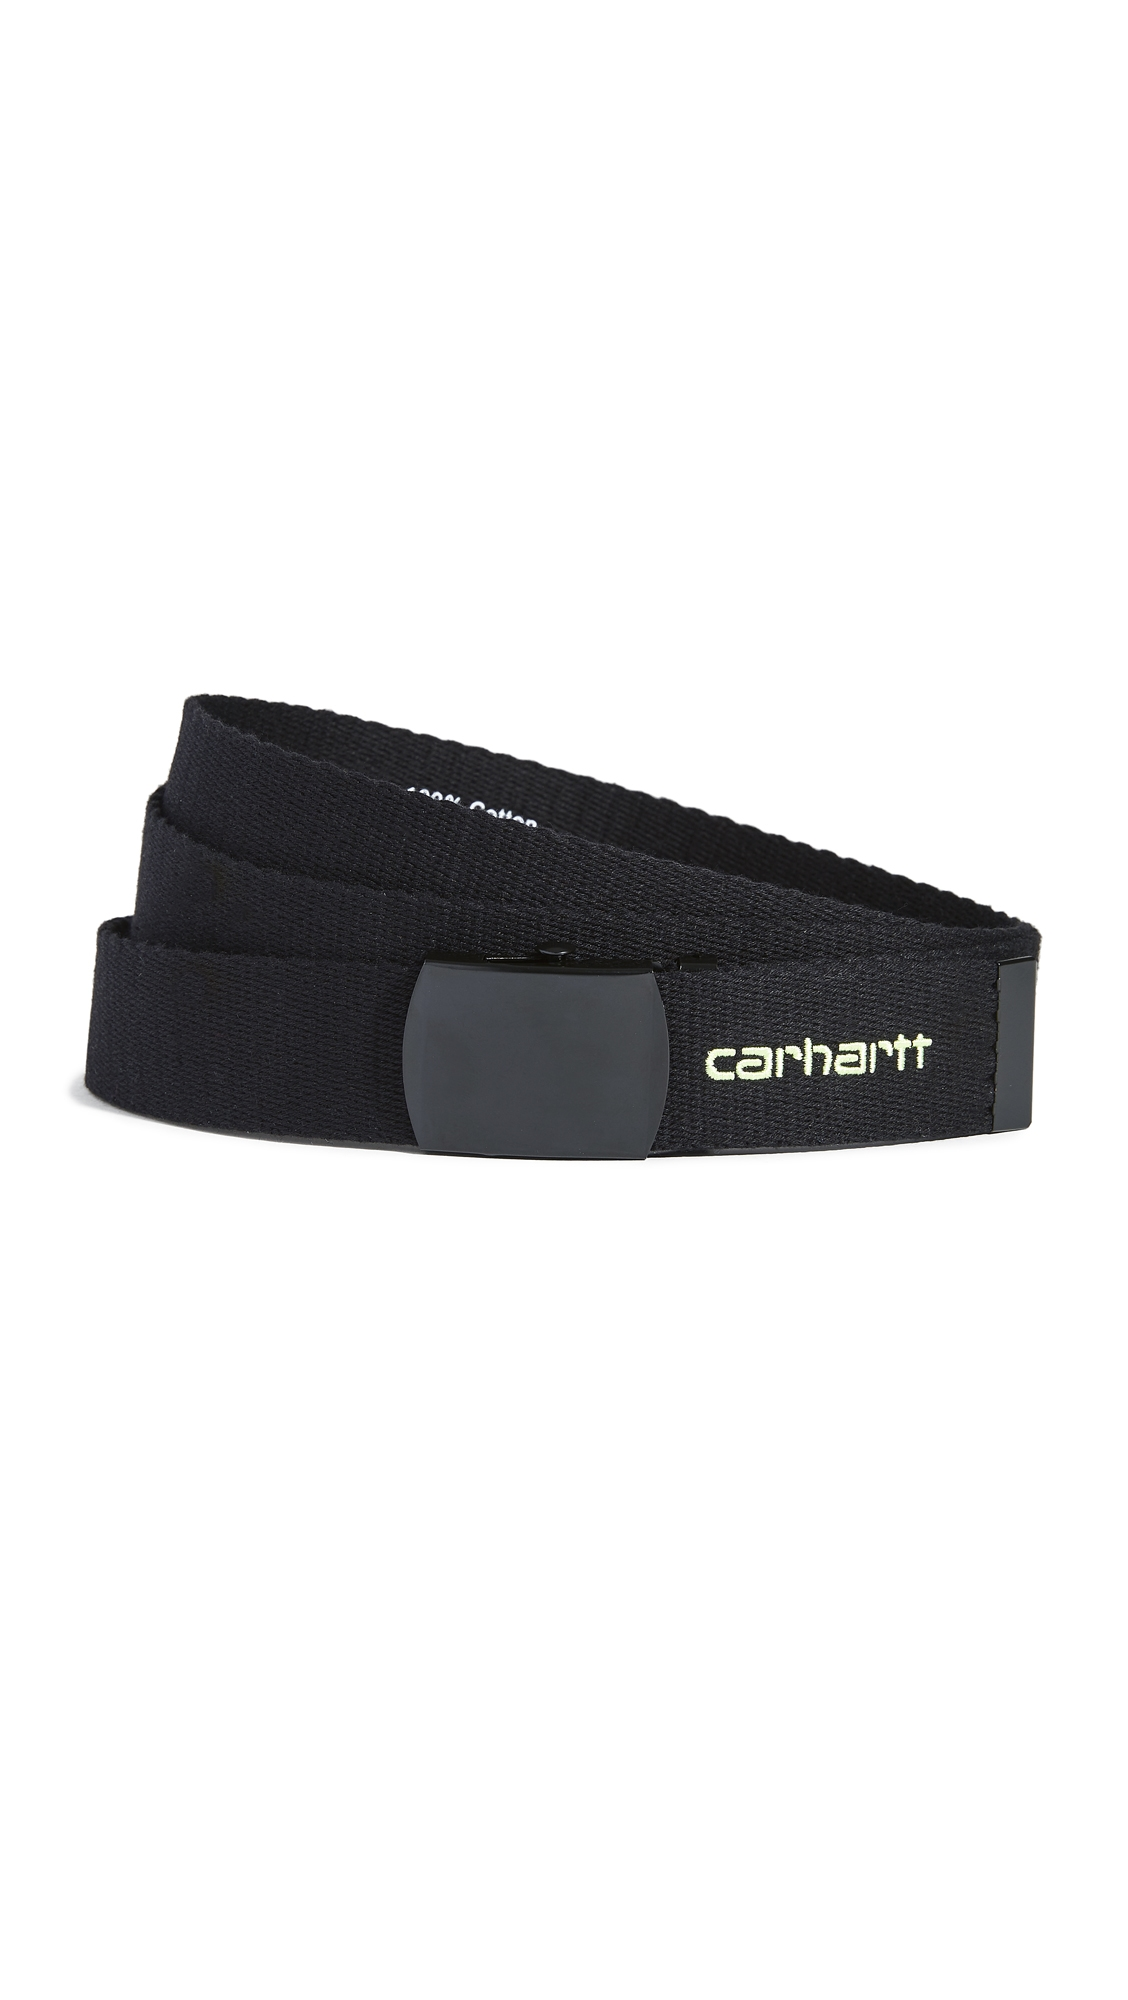 Carhartt ORBIT BELT